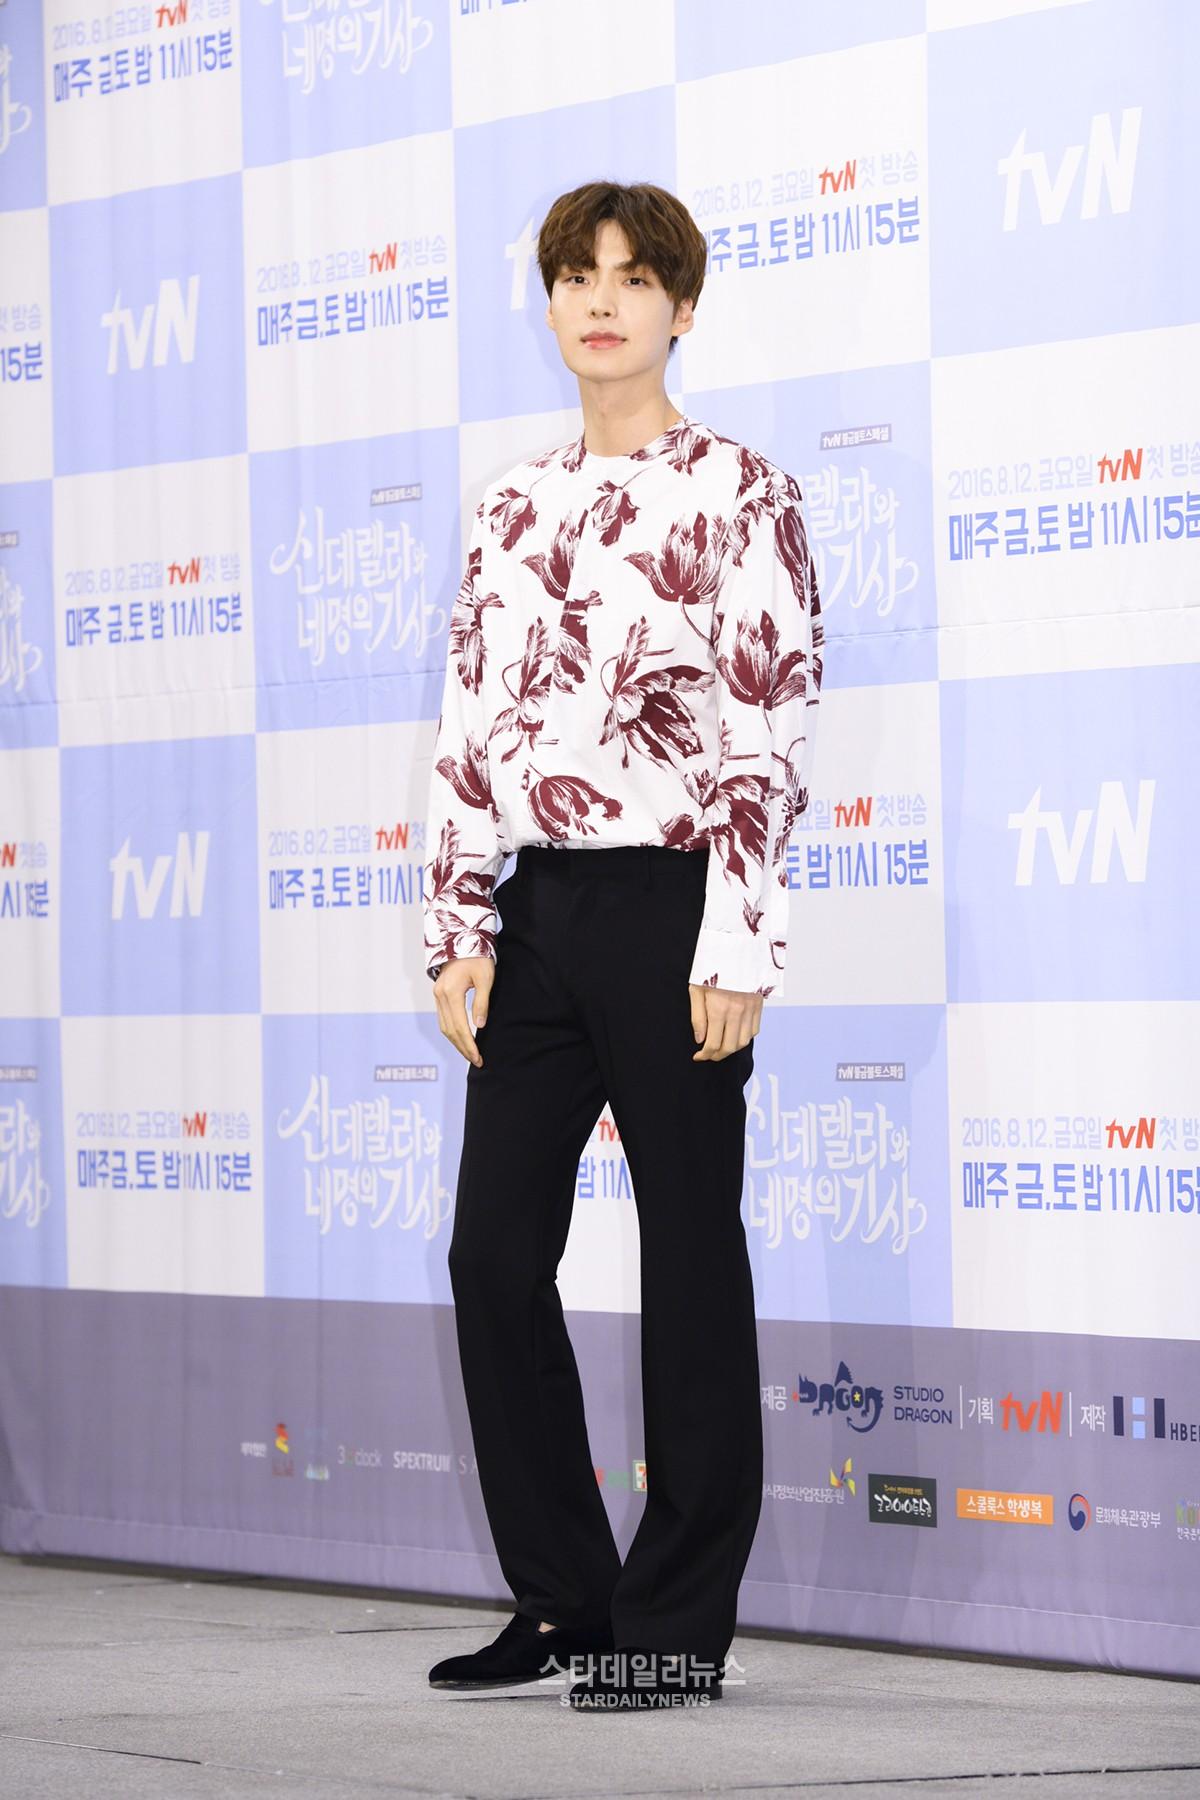 ahn-jae-hyun-press-conference